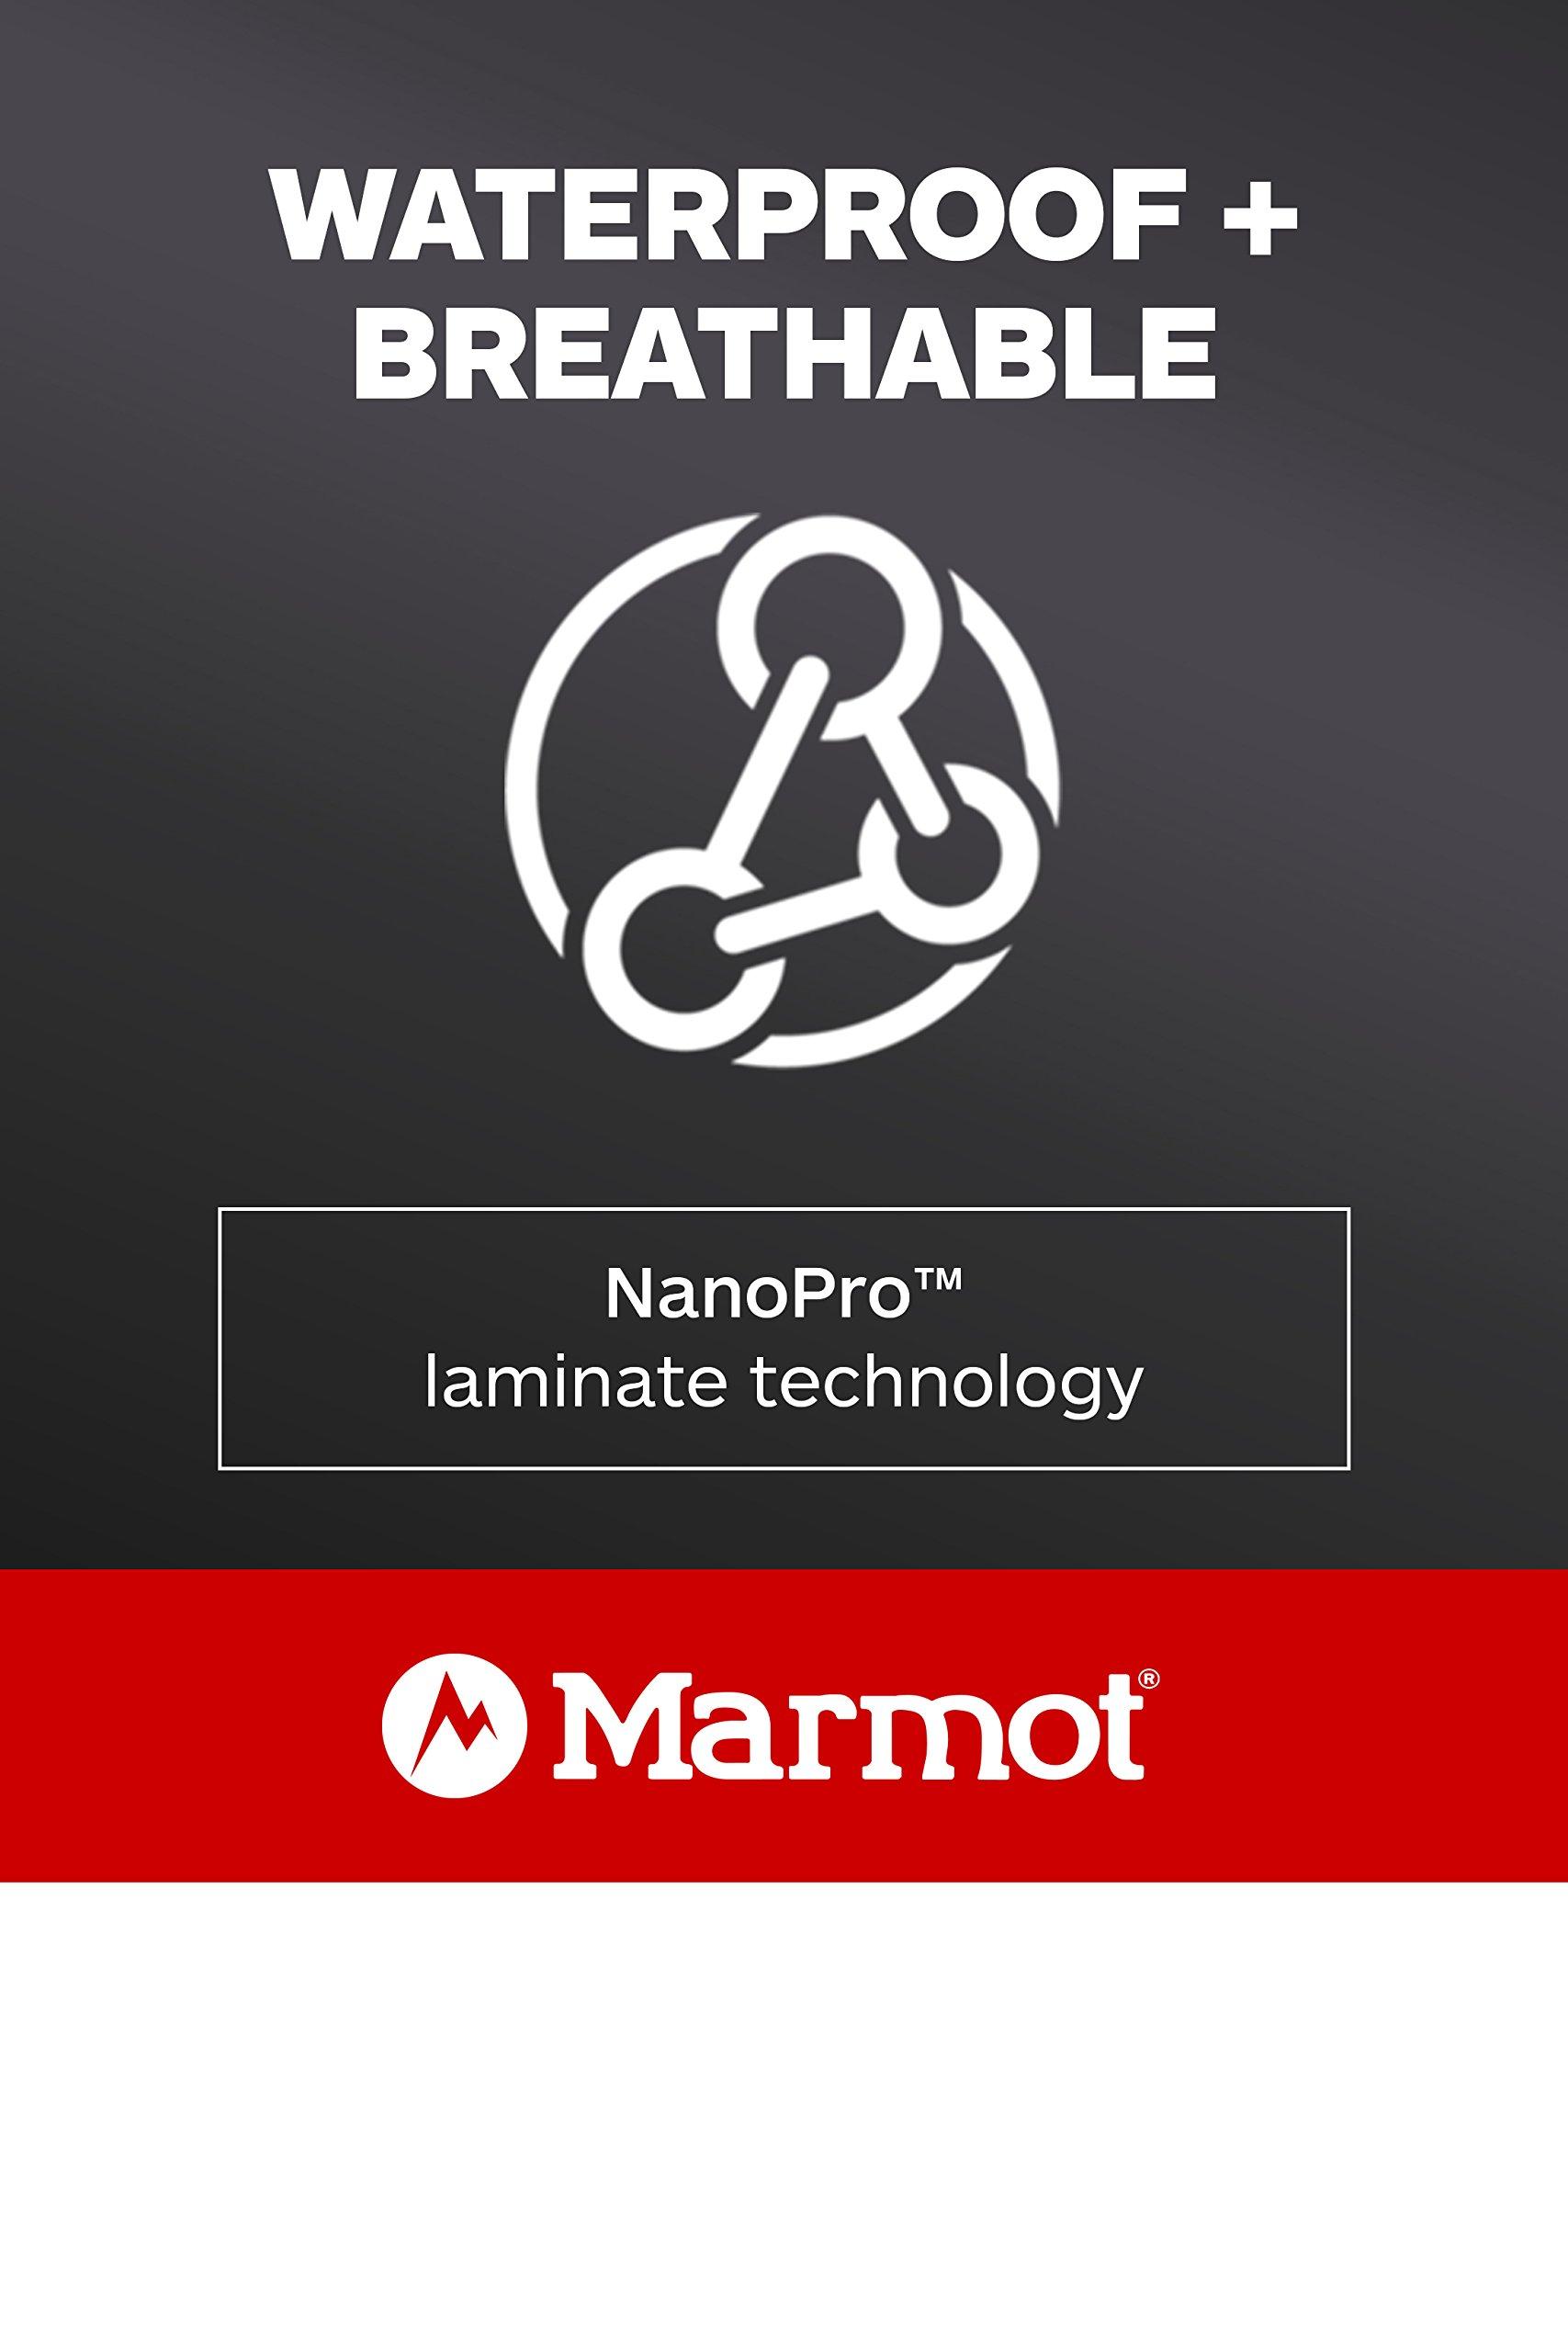 71GOjqaIfIL - Marmot PreCip Lightweight Raincoat, Men, Waterproof, Windproof & Breathable